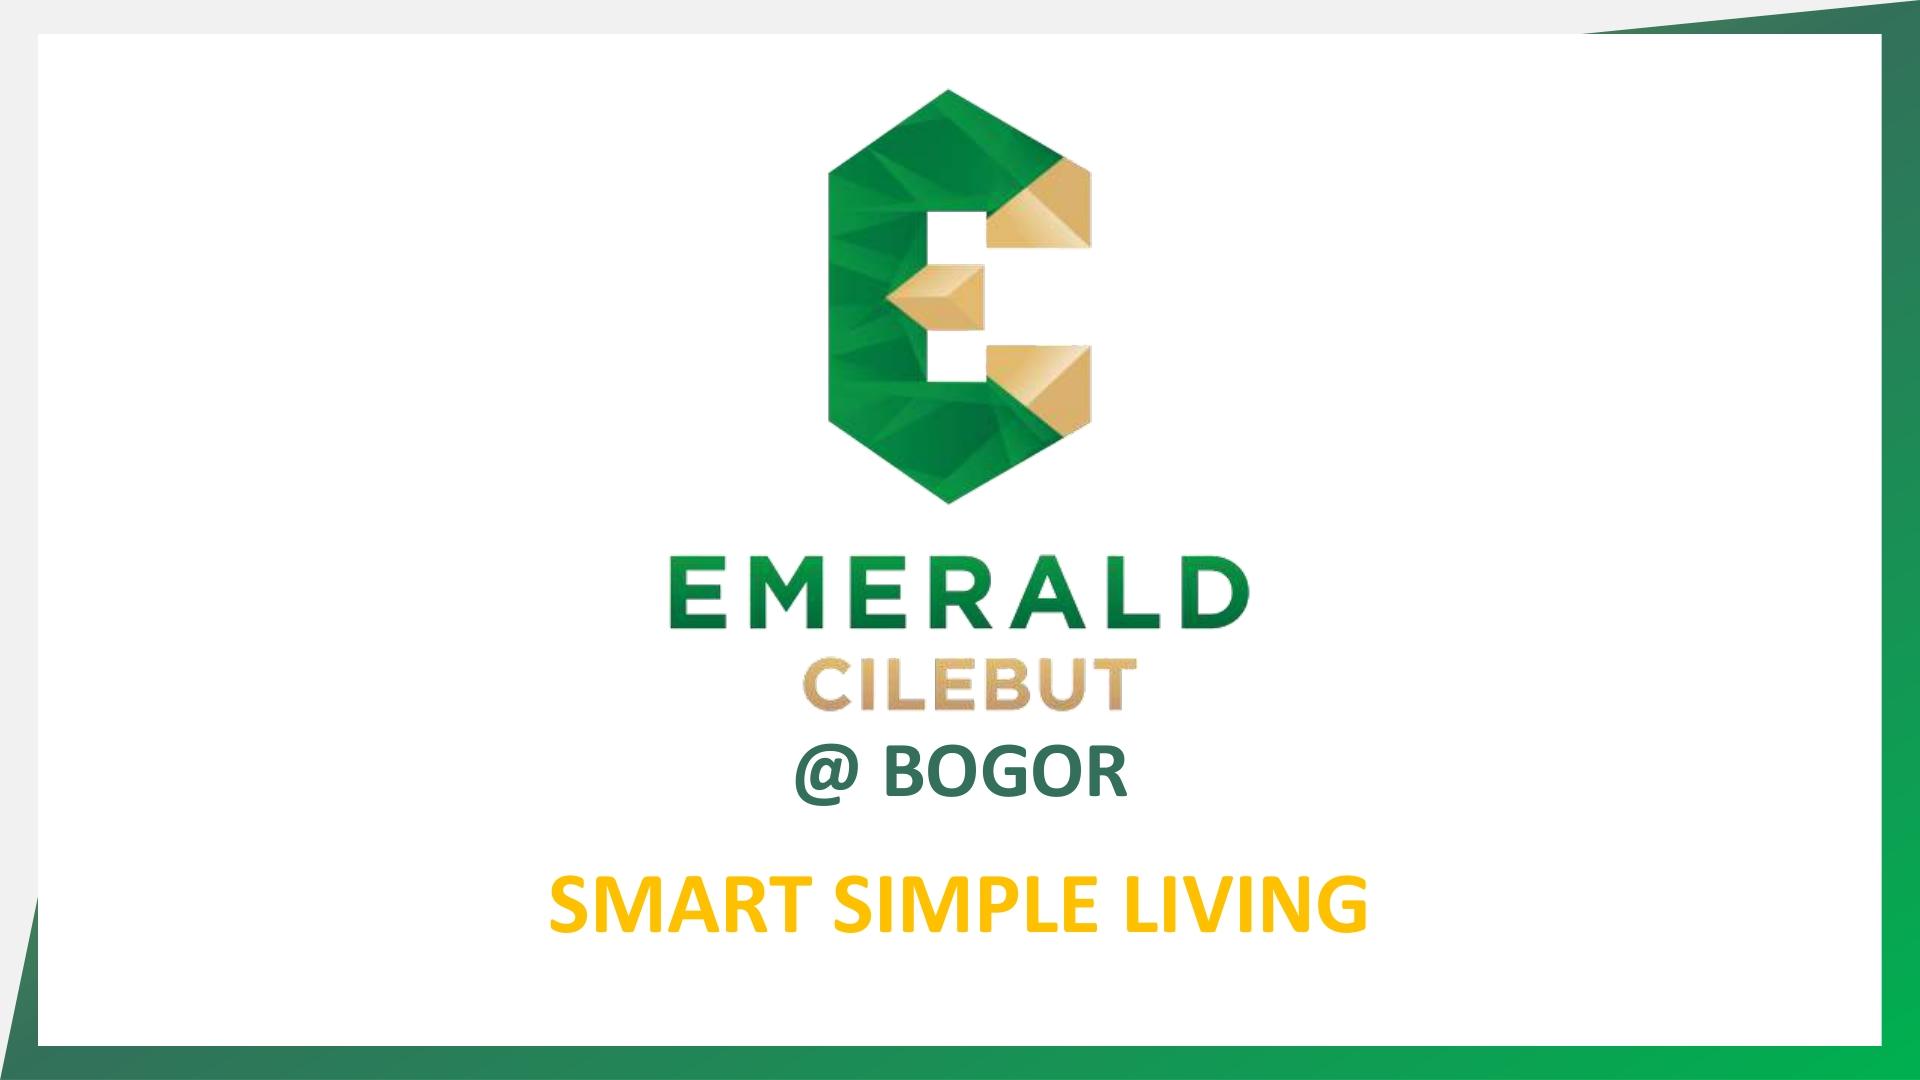 emerald-cilebut